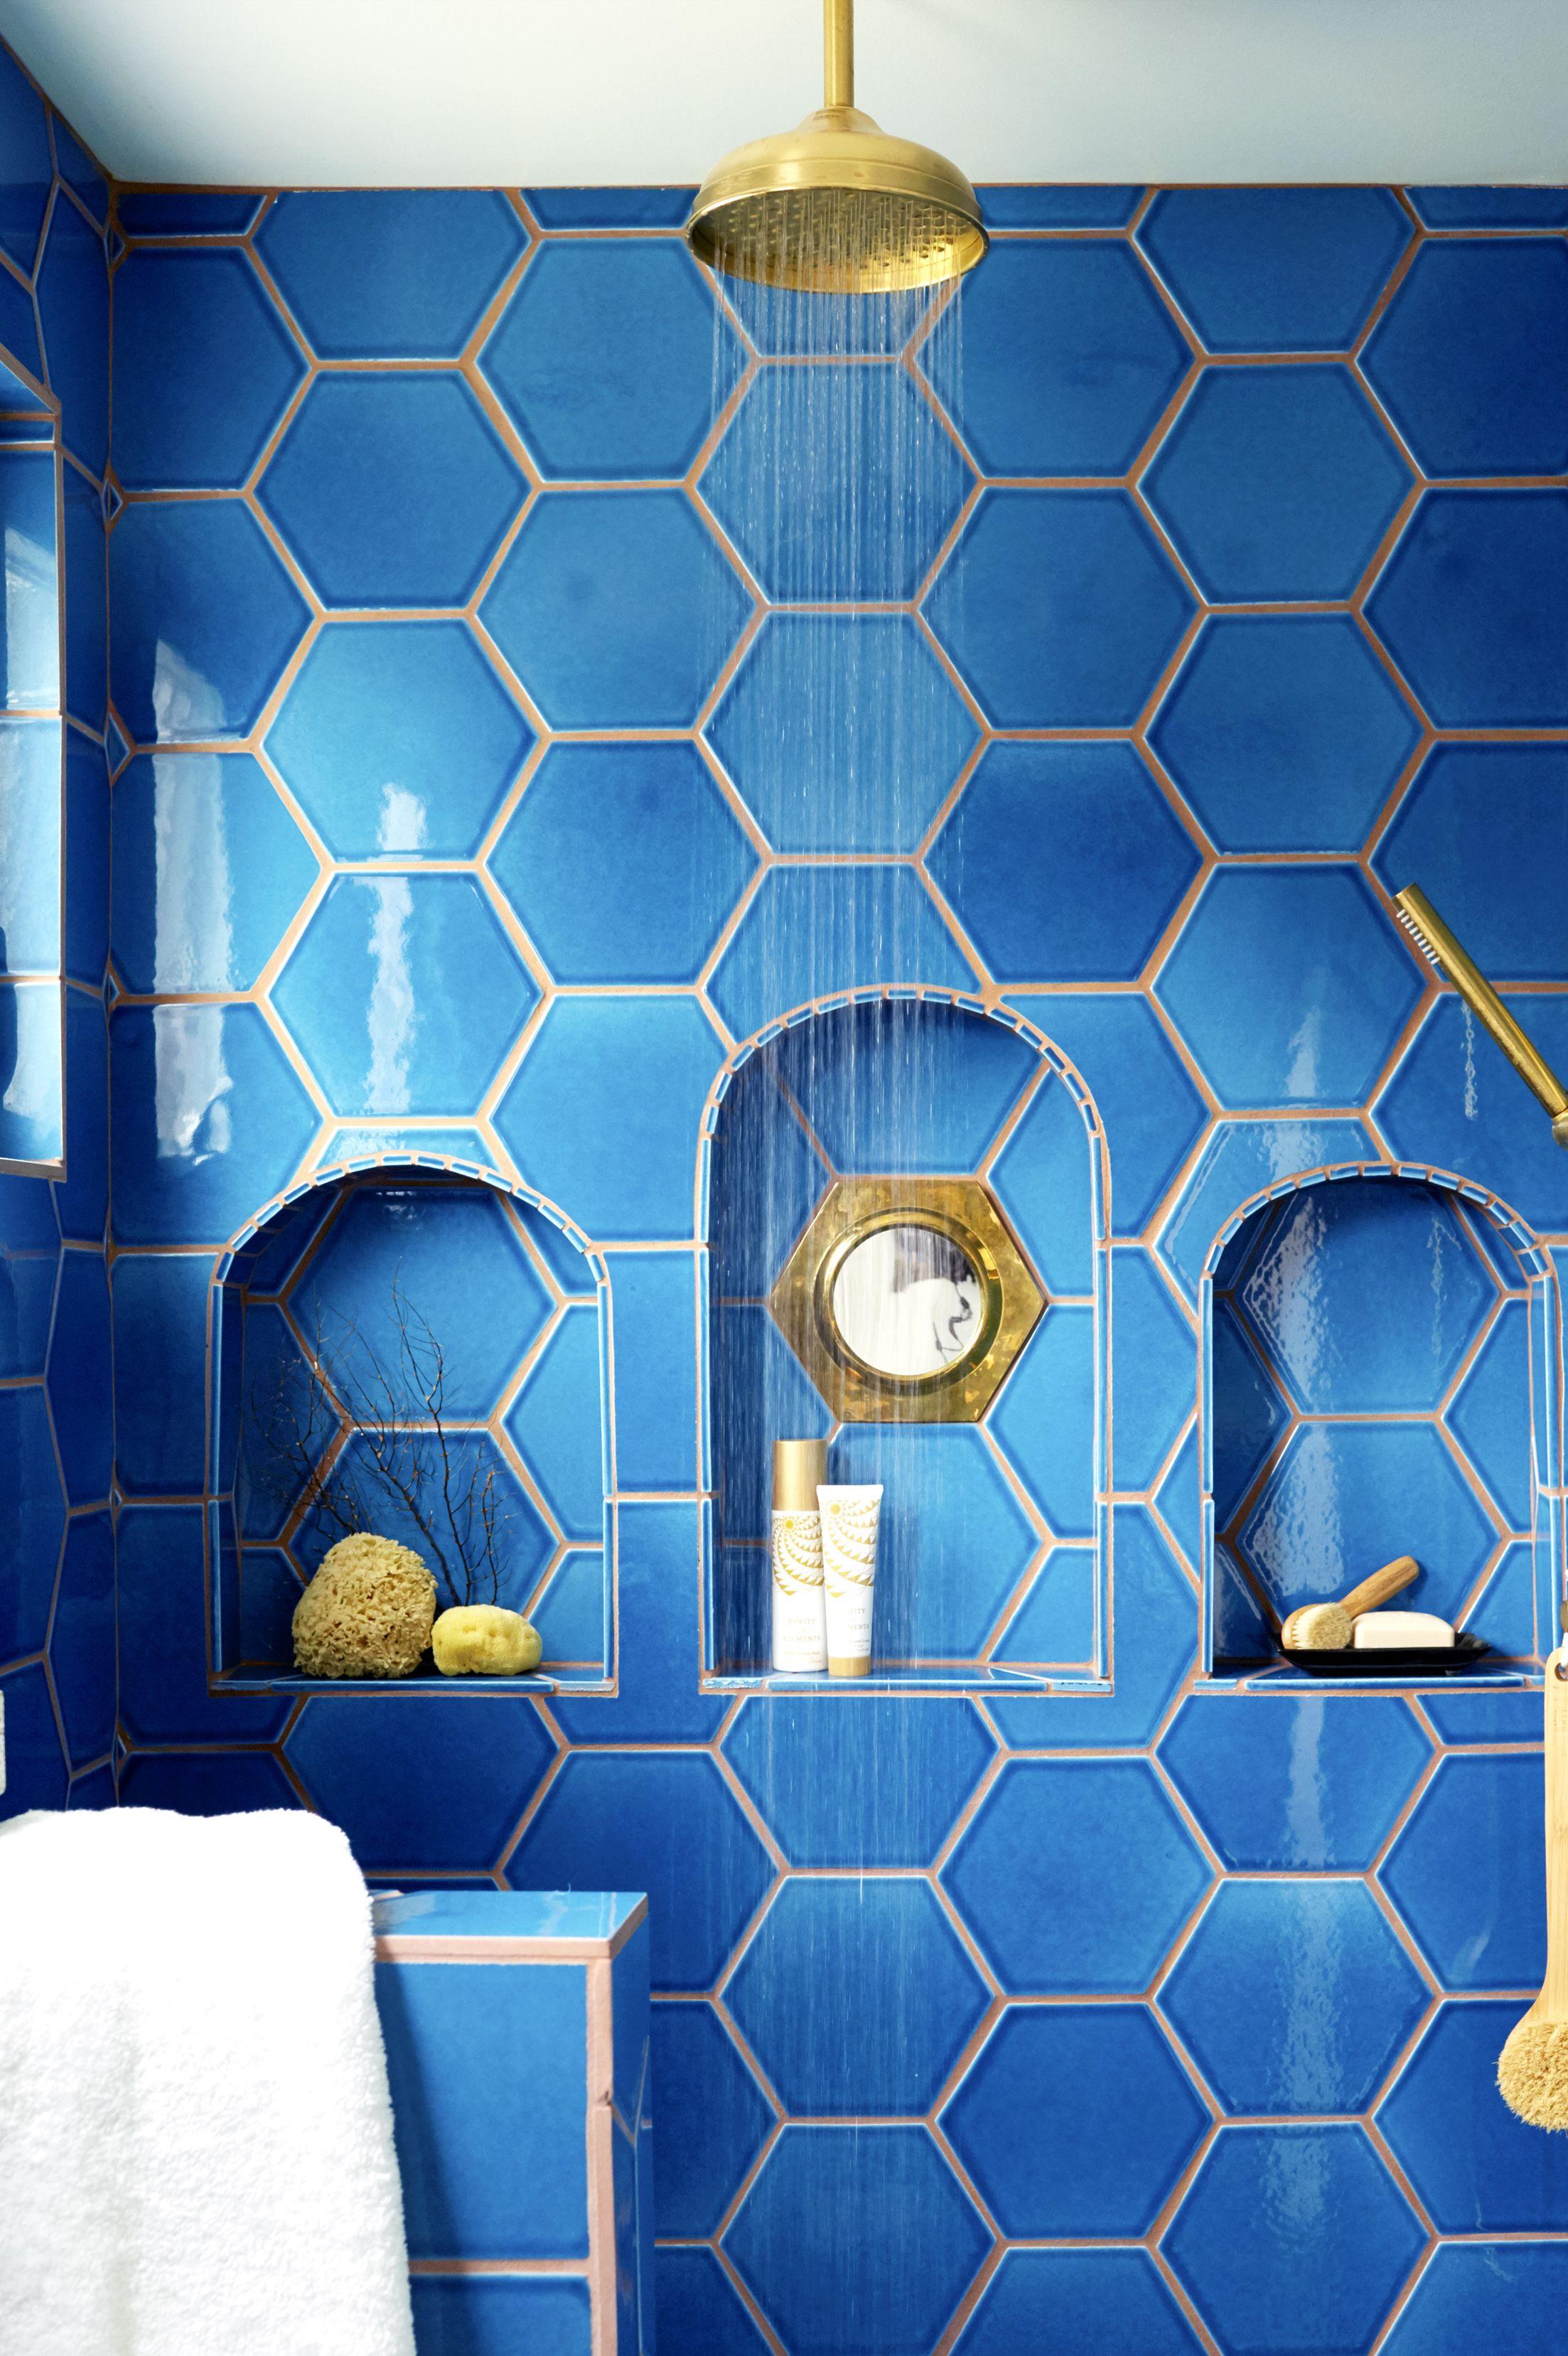 The Most Fun Bathroom Tile Ideas Ever